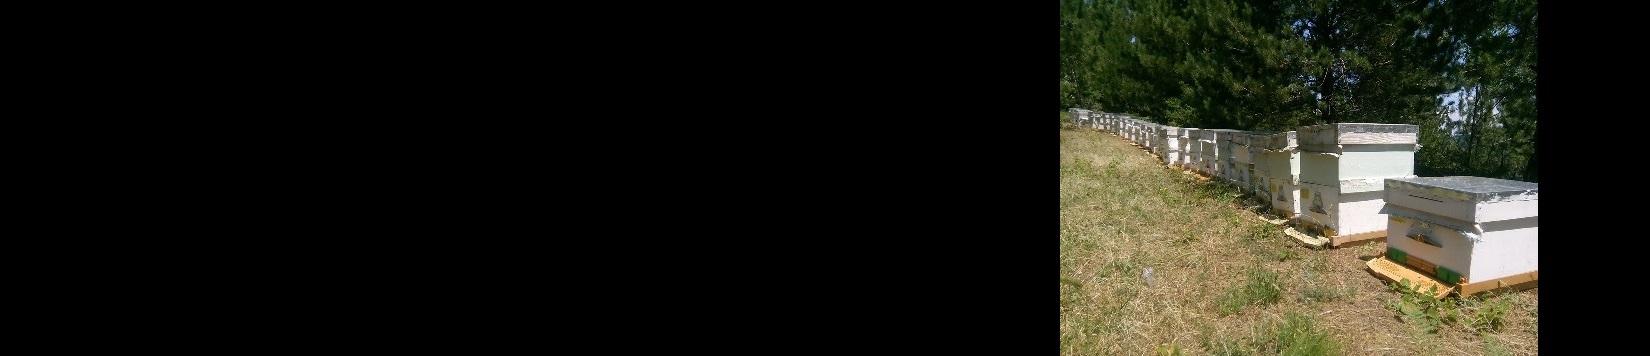 Turan Dinç